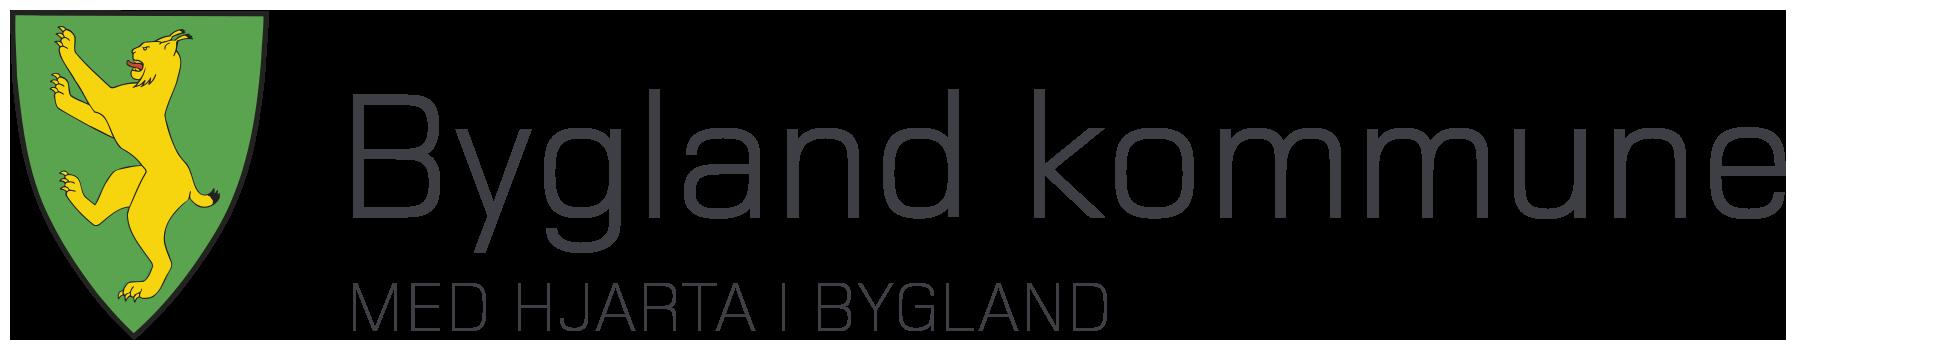 Bygland kommune logo